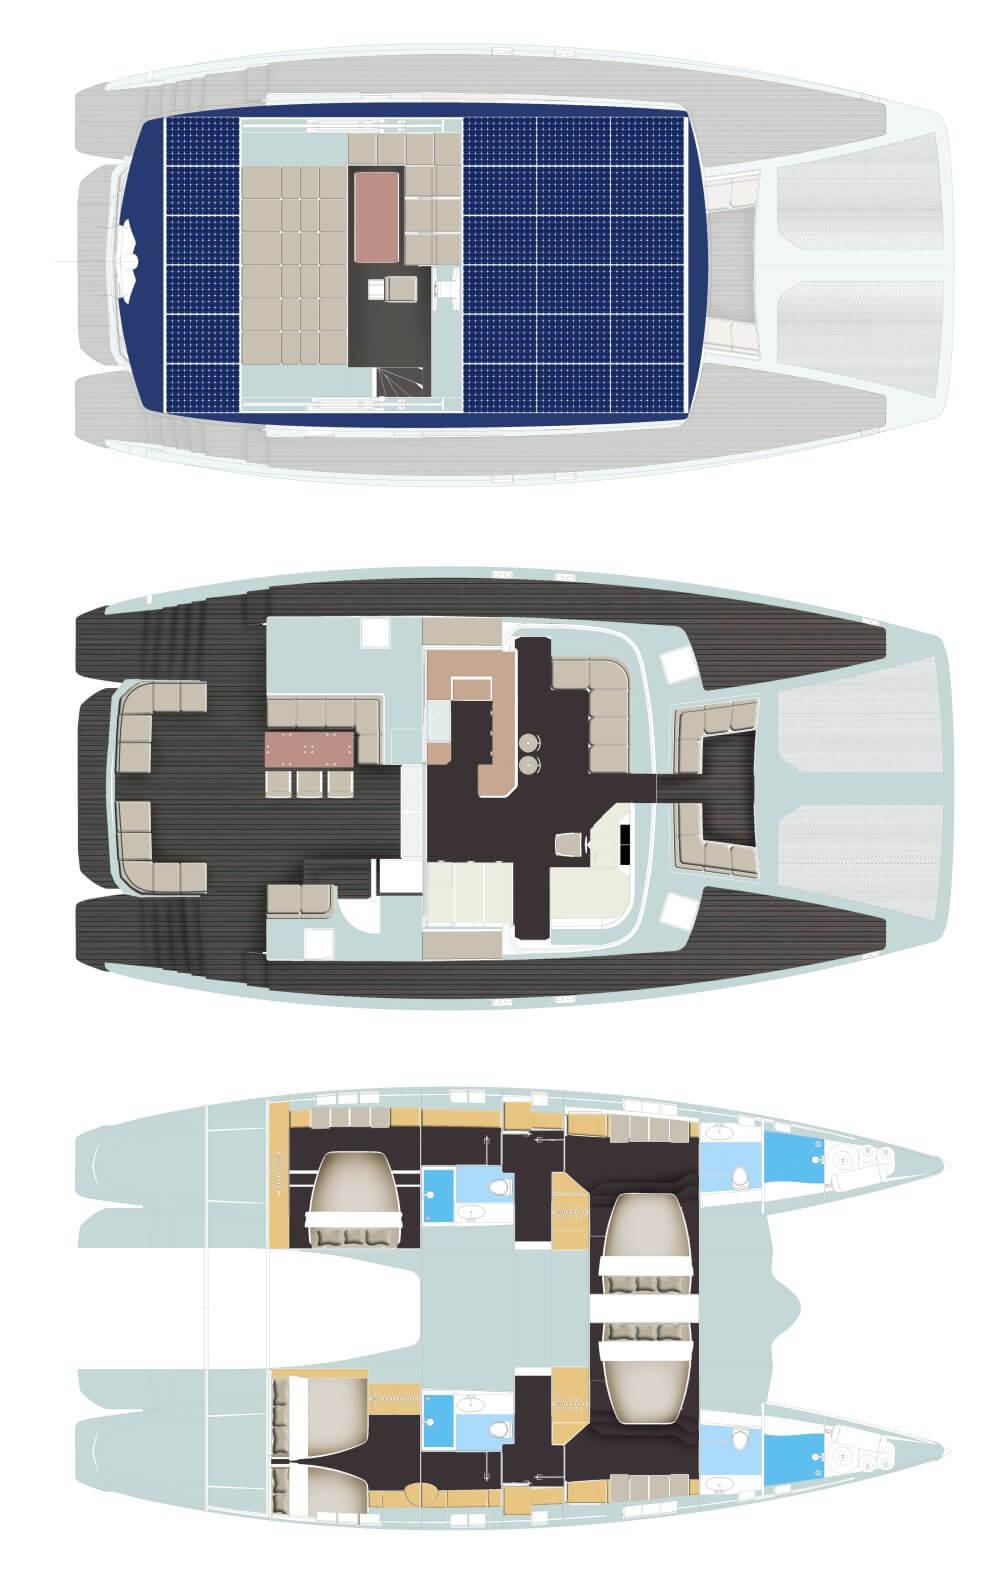 SolarCat 64